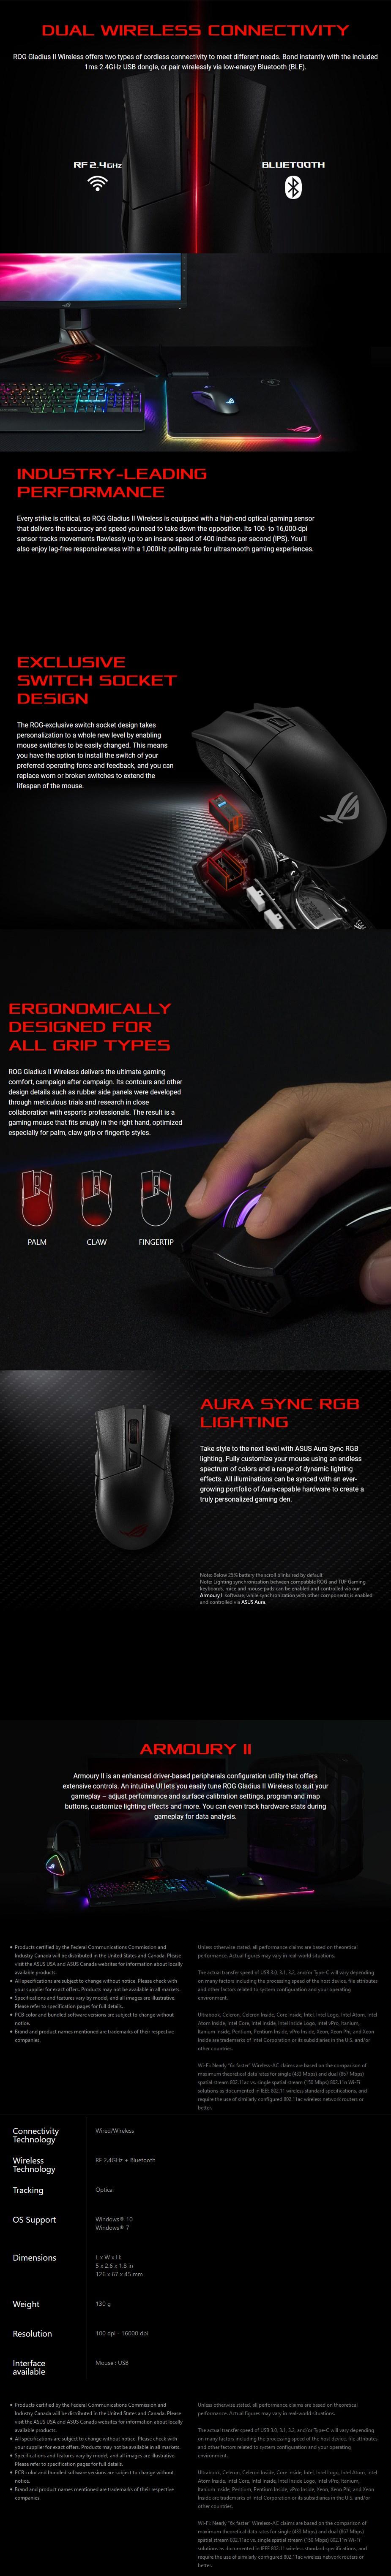 asus-rog-gladius-ii-core-p702-wireless-gaming-mouse-ac30711-1.jpg